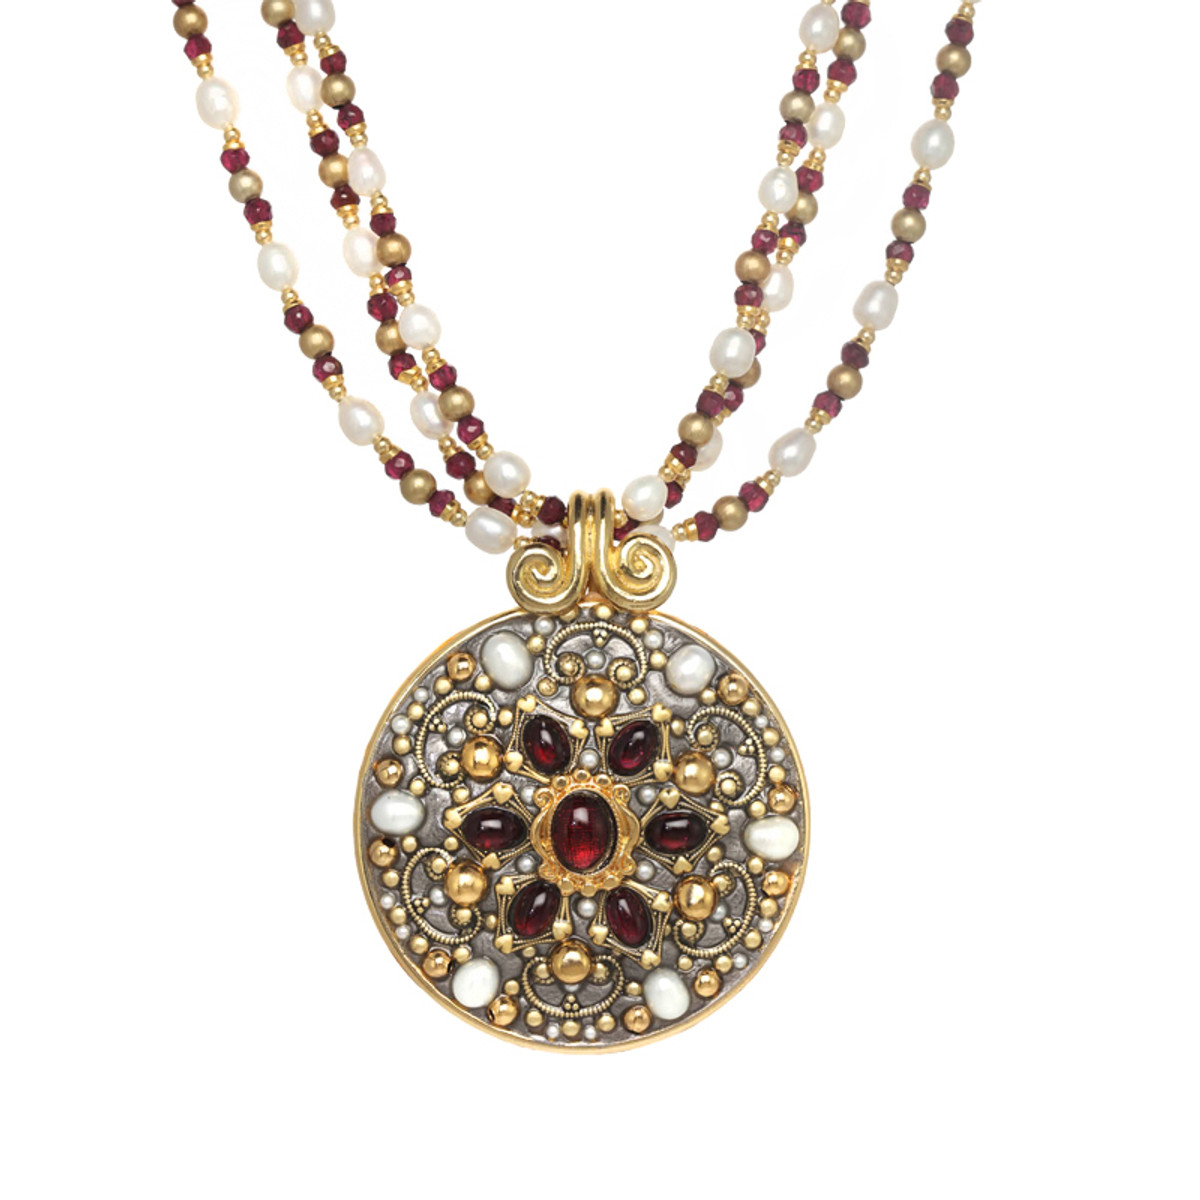 Michal Golan Victorian Medallion Necklace